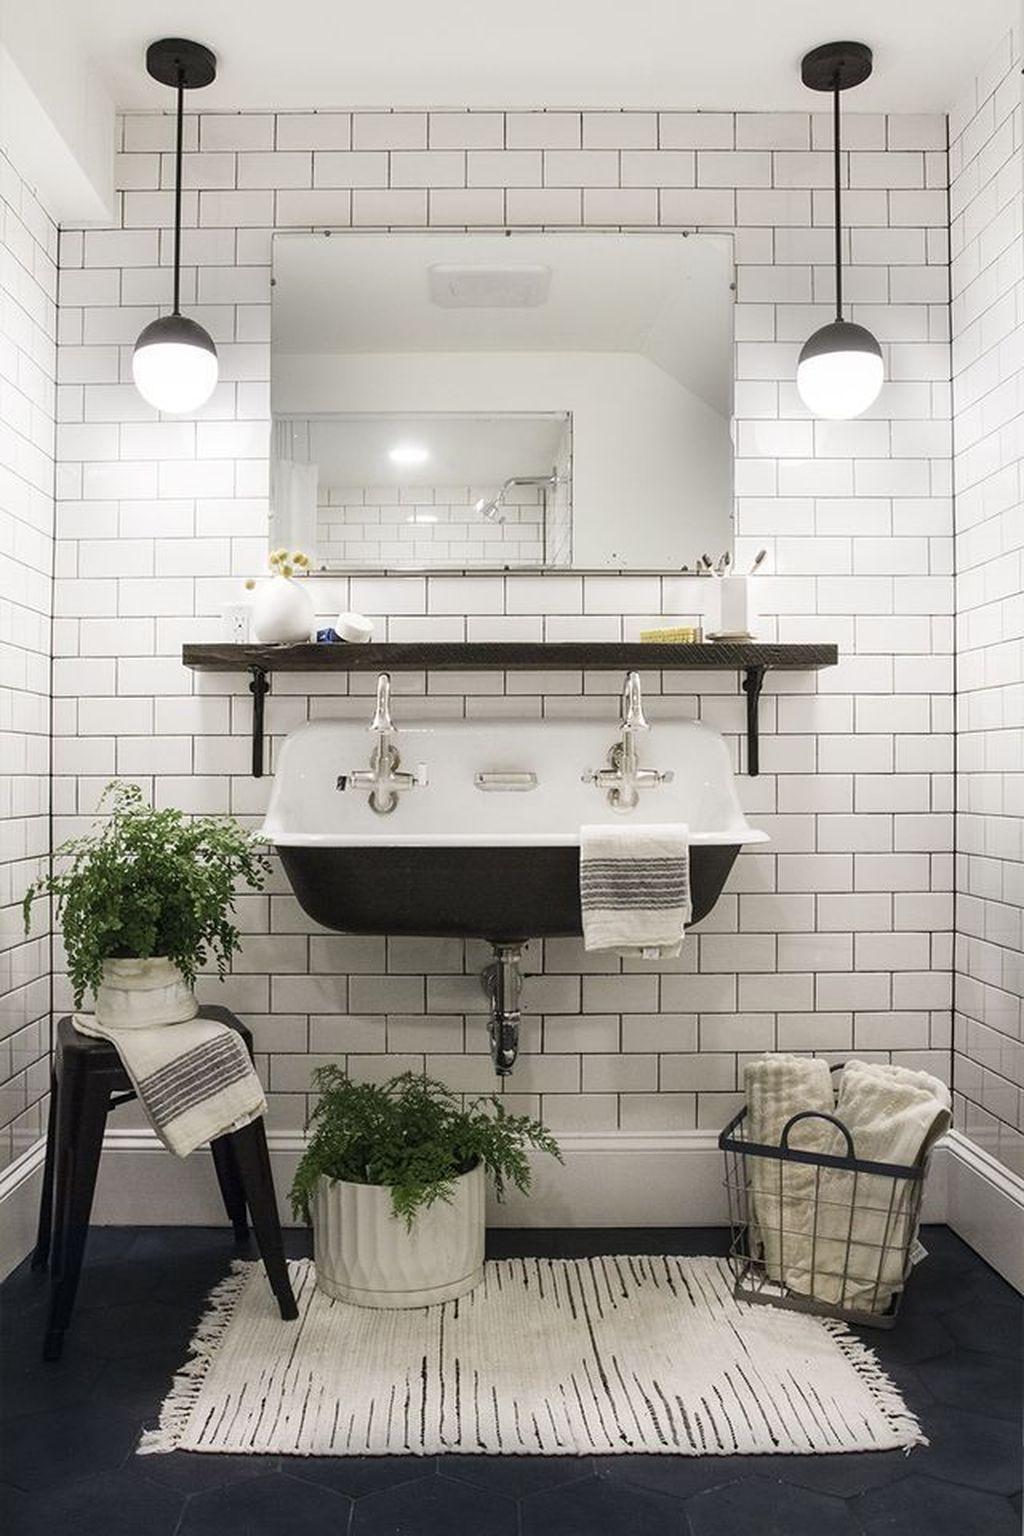 39 Cool And Stylish Small Bathroom Design Ideas32